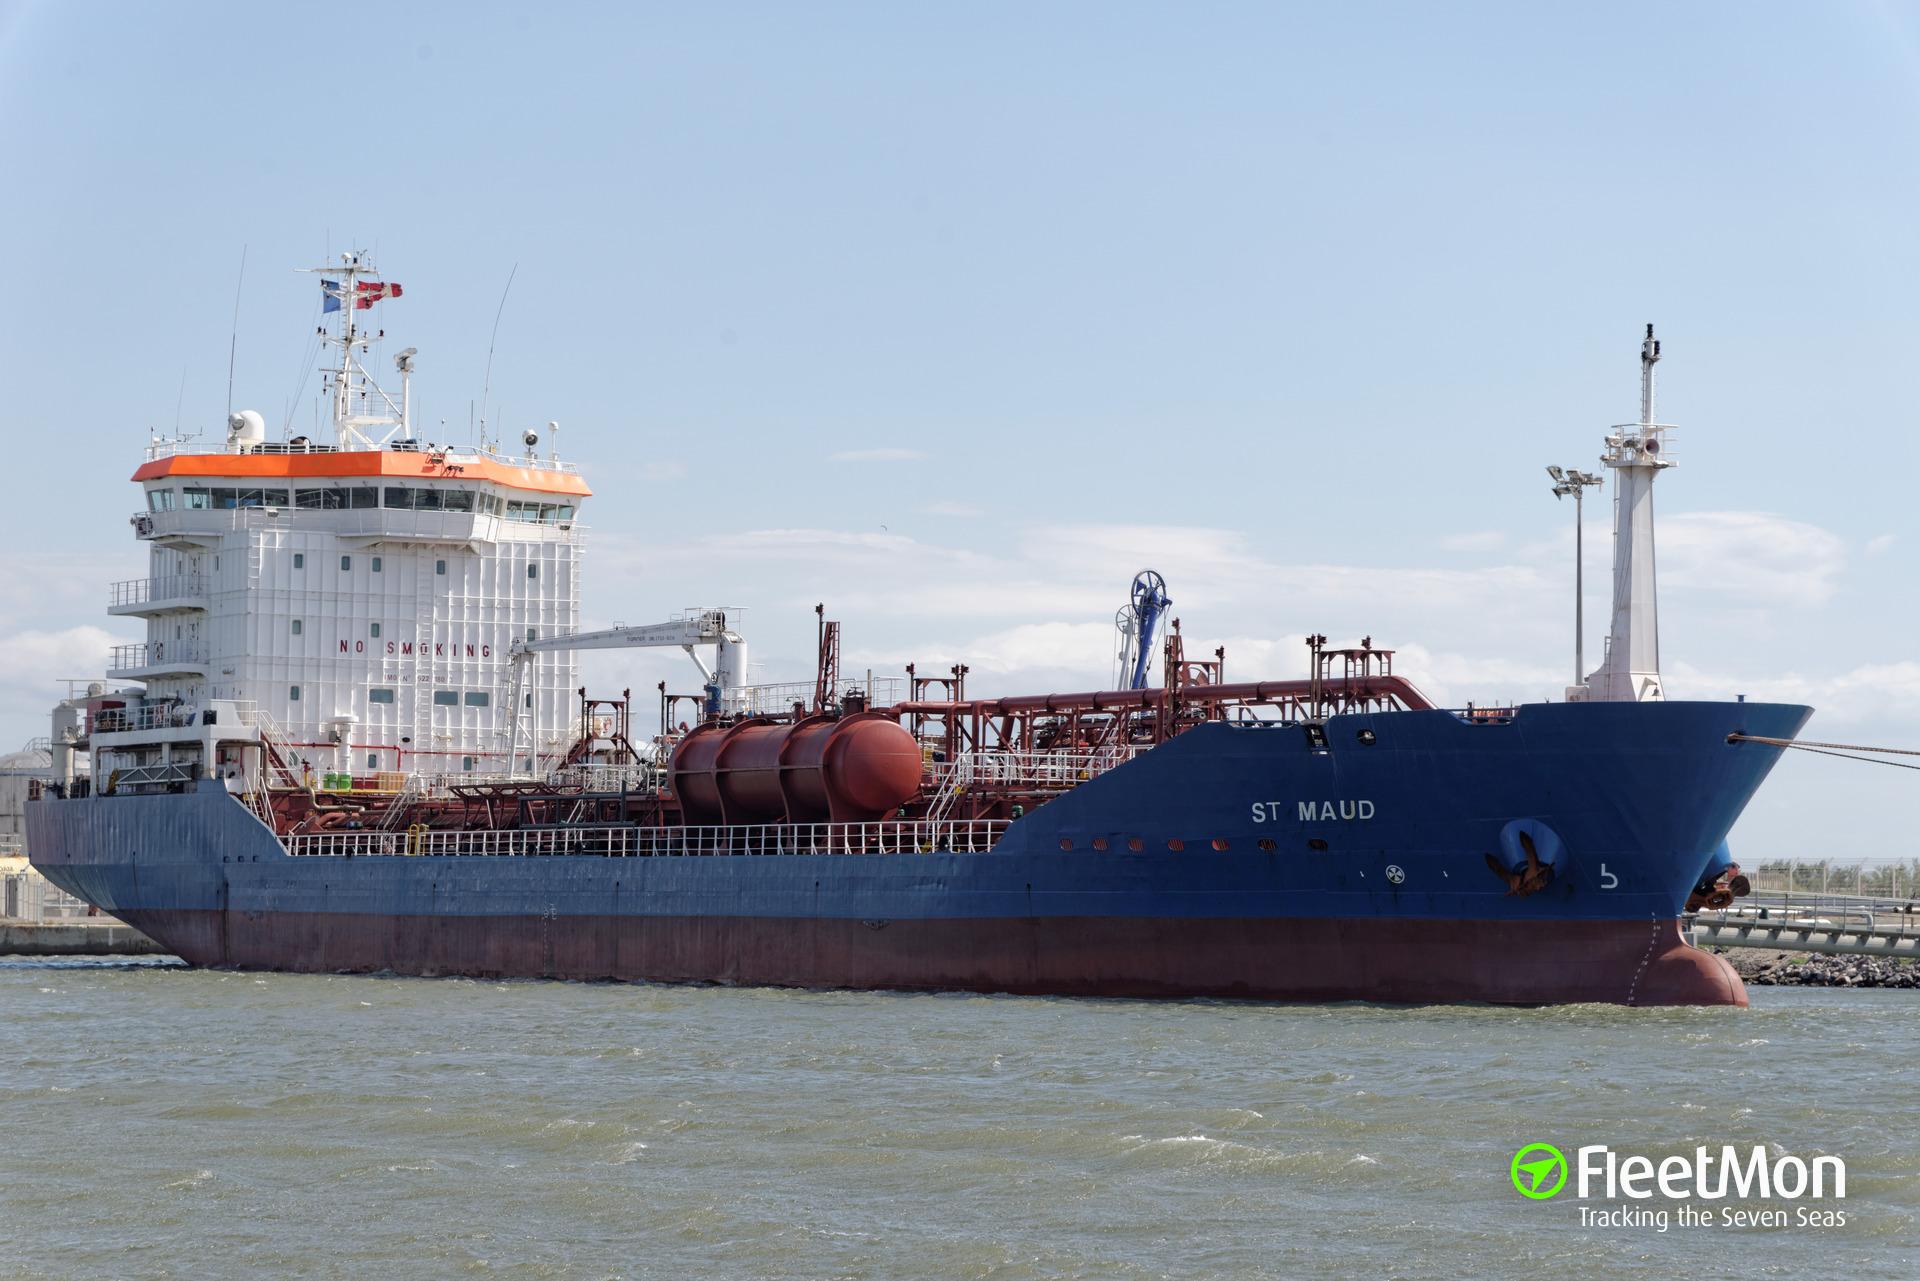 UAE's tanker attacked off Yemen coast UPDATE